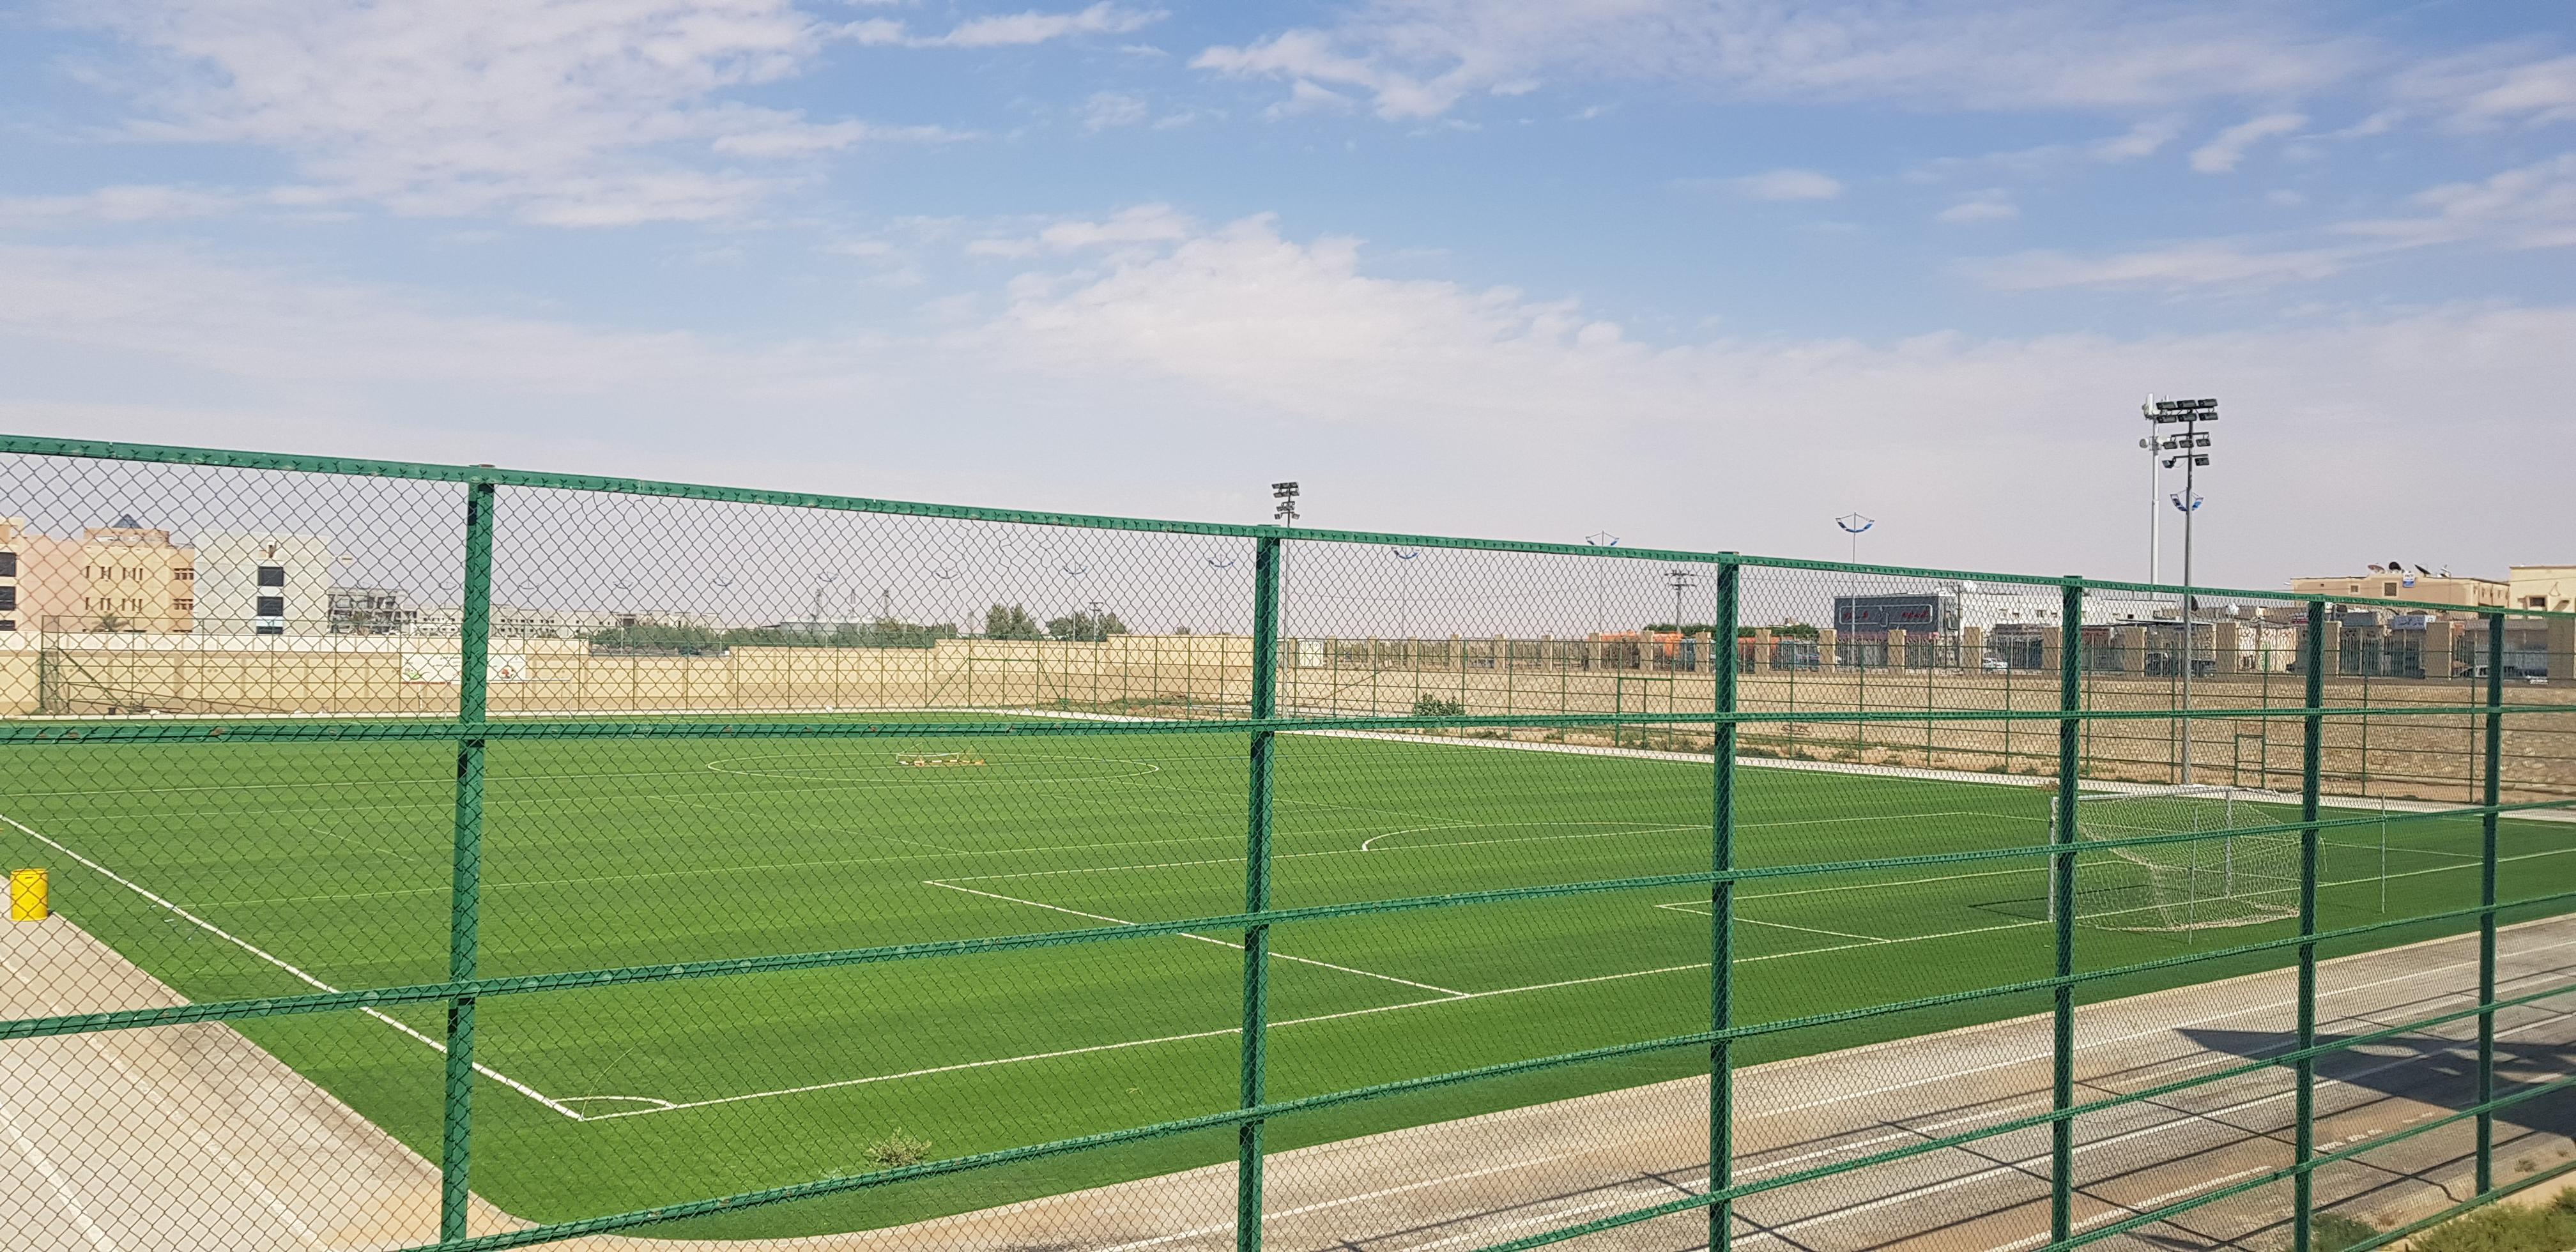 845e72b98 ملف:ملعب كرة قدم - الكلية التقنية بالخرج.jpg - ويكيبيديا، الموسوعة الحرة